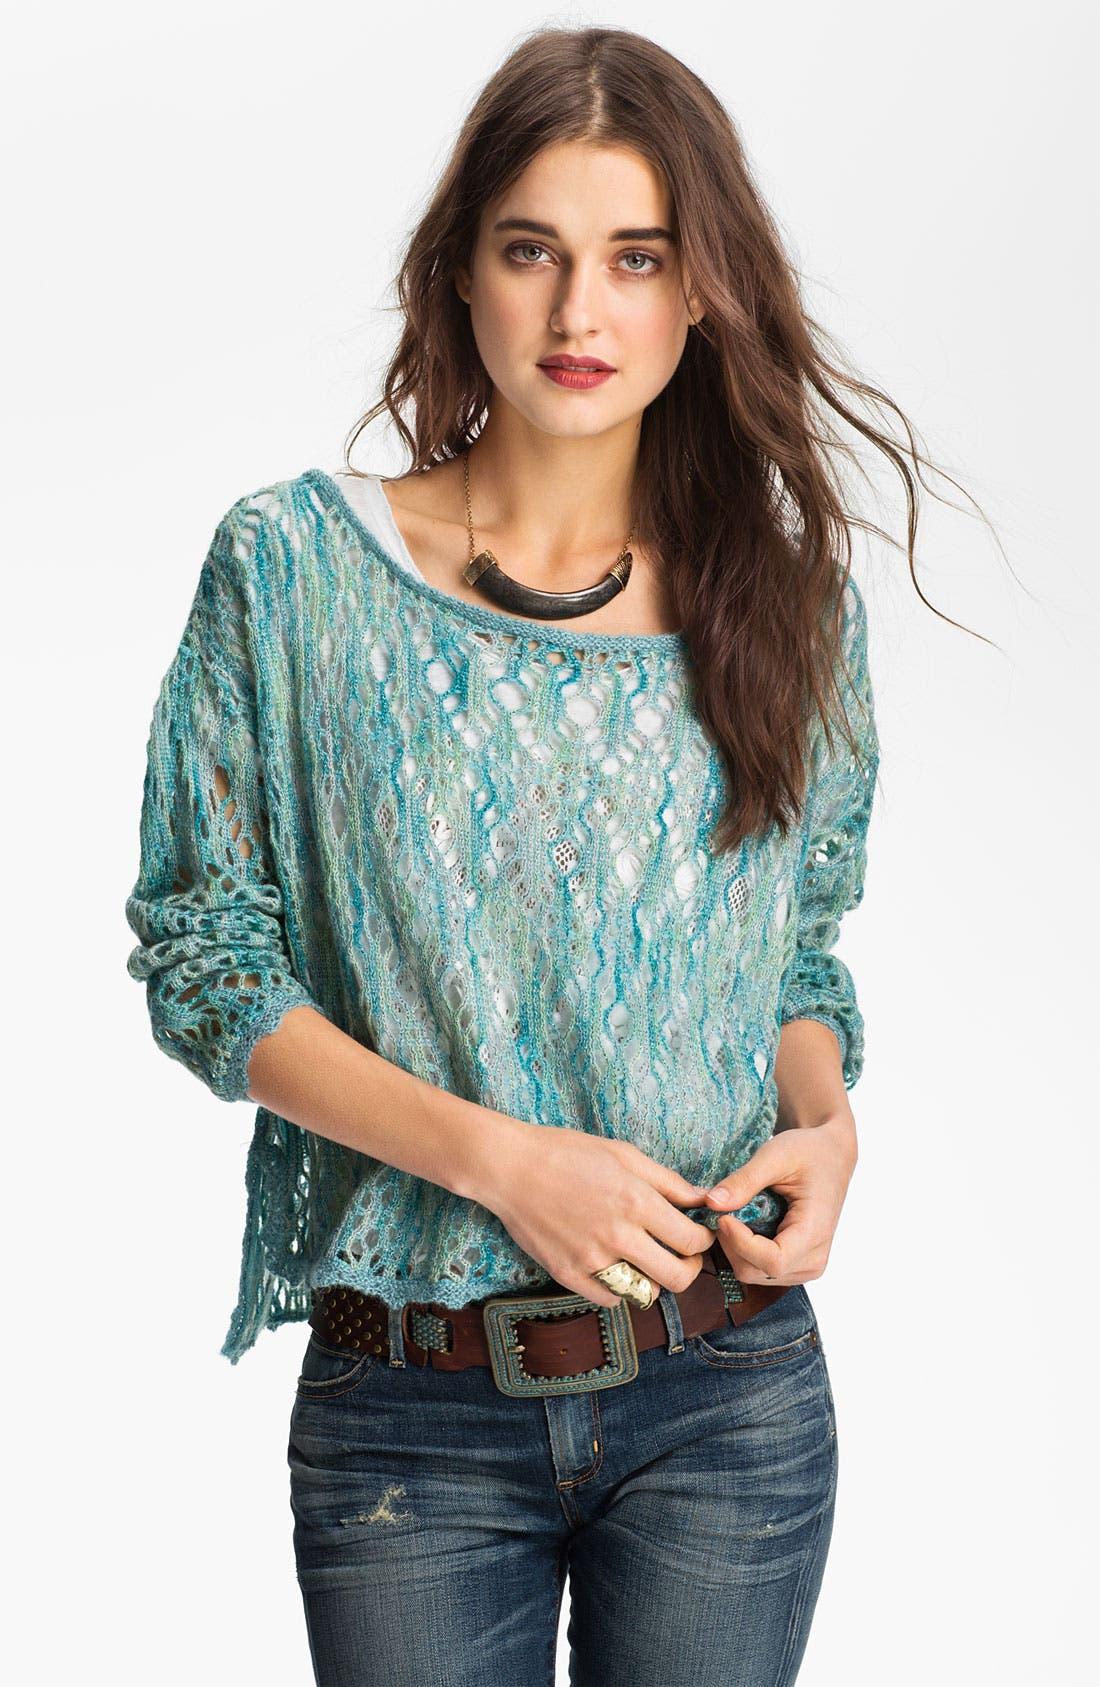 Main Image - Free People Crochet Top